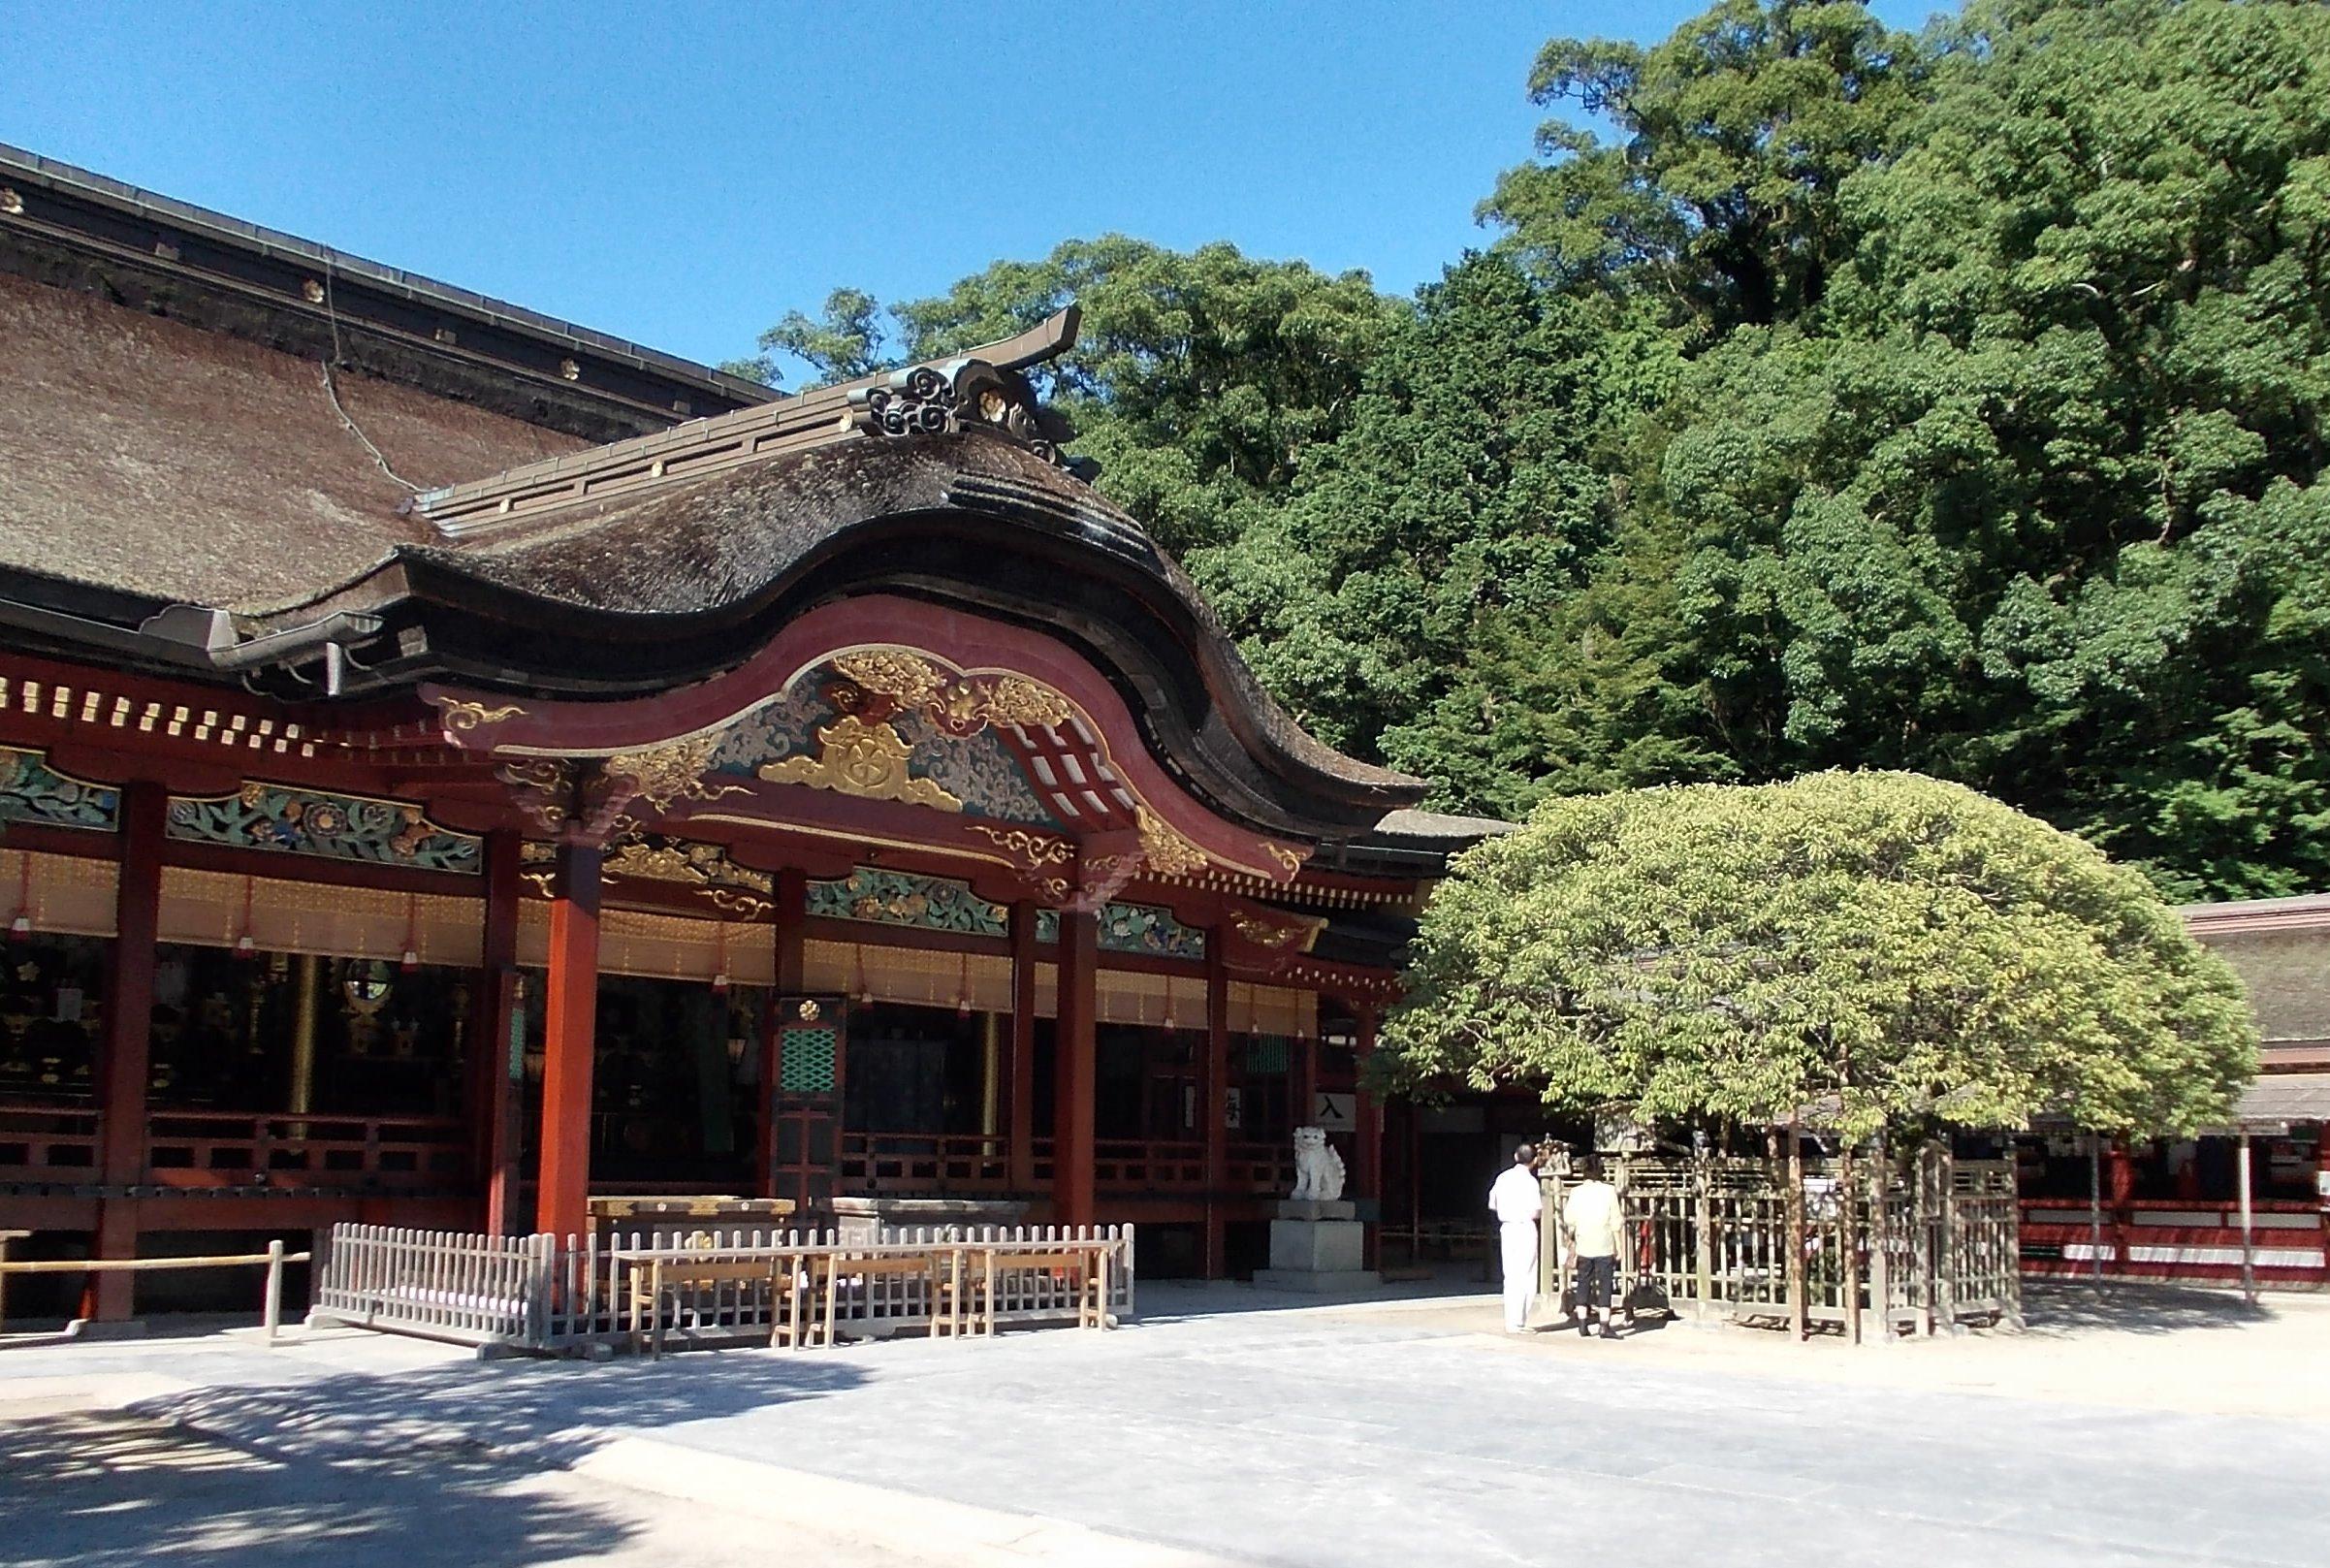 File:Dazaifu Tenmangu 07.jpg - Wikimedia Commons